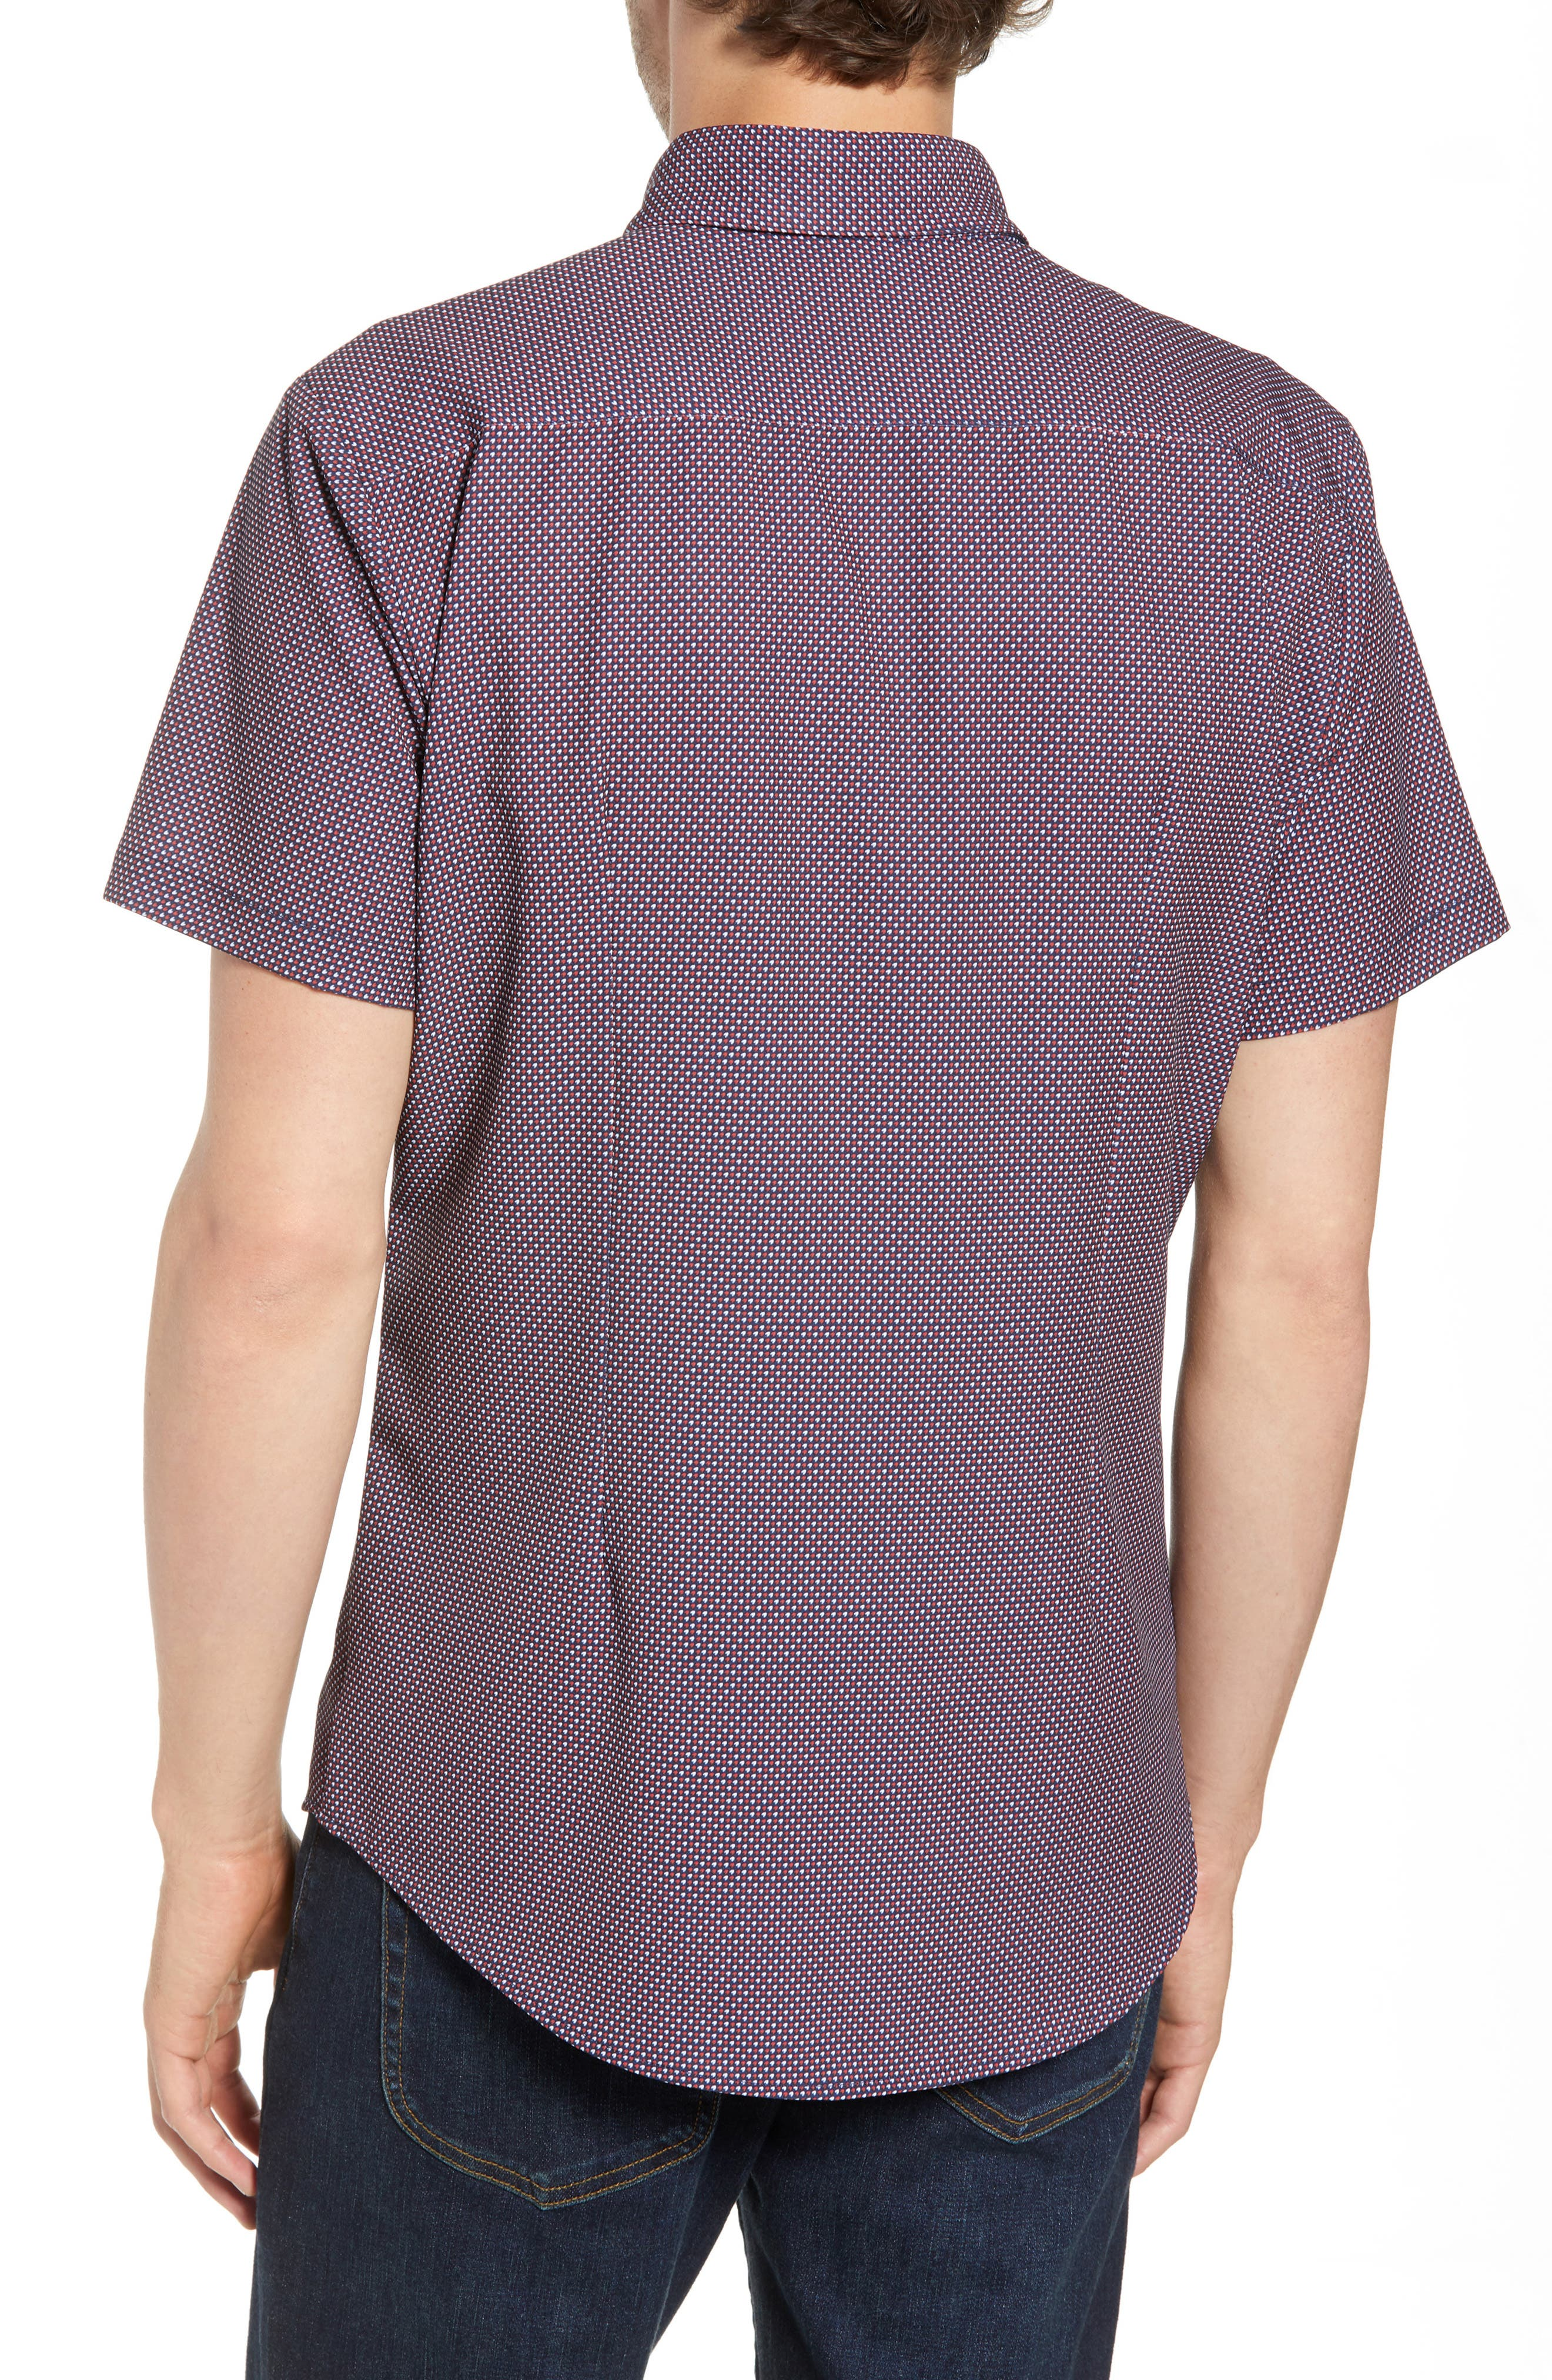 Gibson Slim Fit Dot Performance Sport Shirt,                             Alternate thumbnail 4, color,                             Red